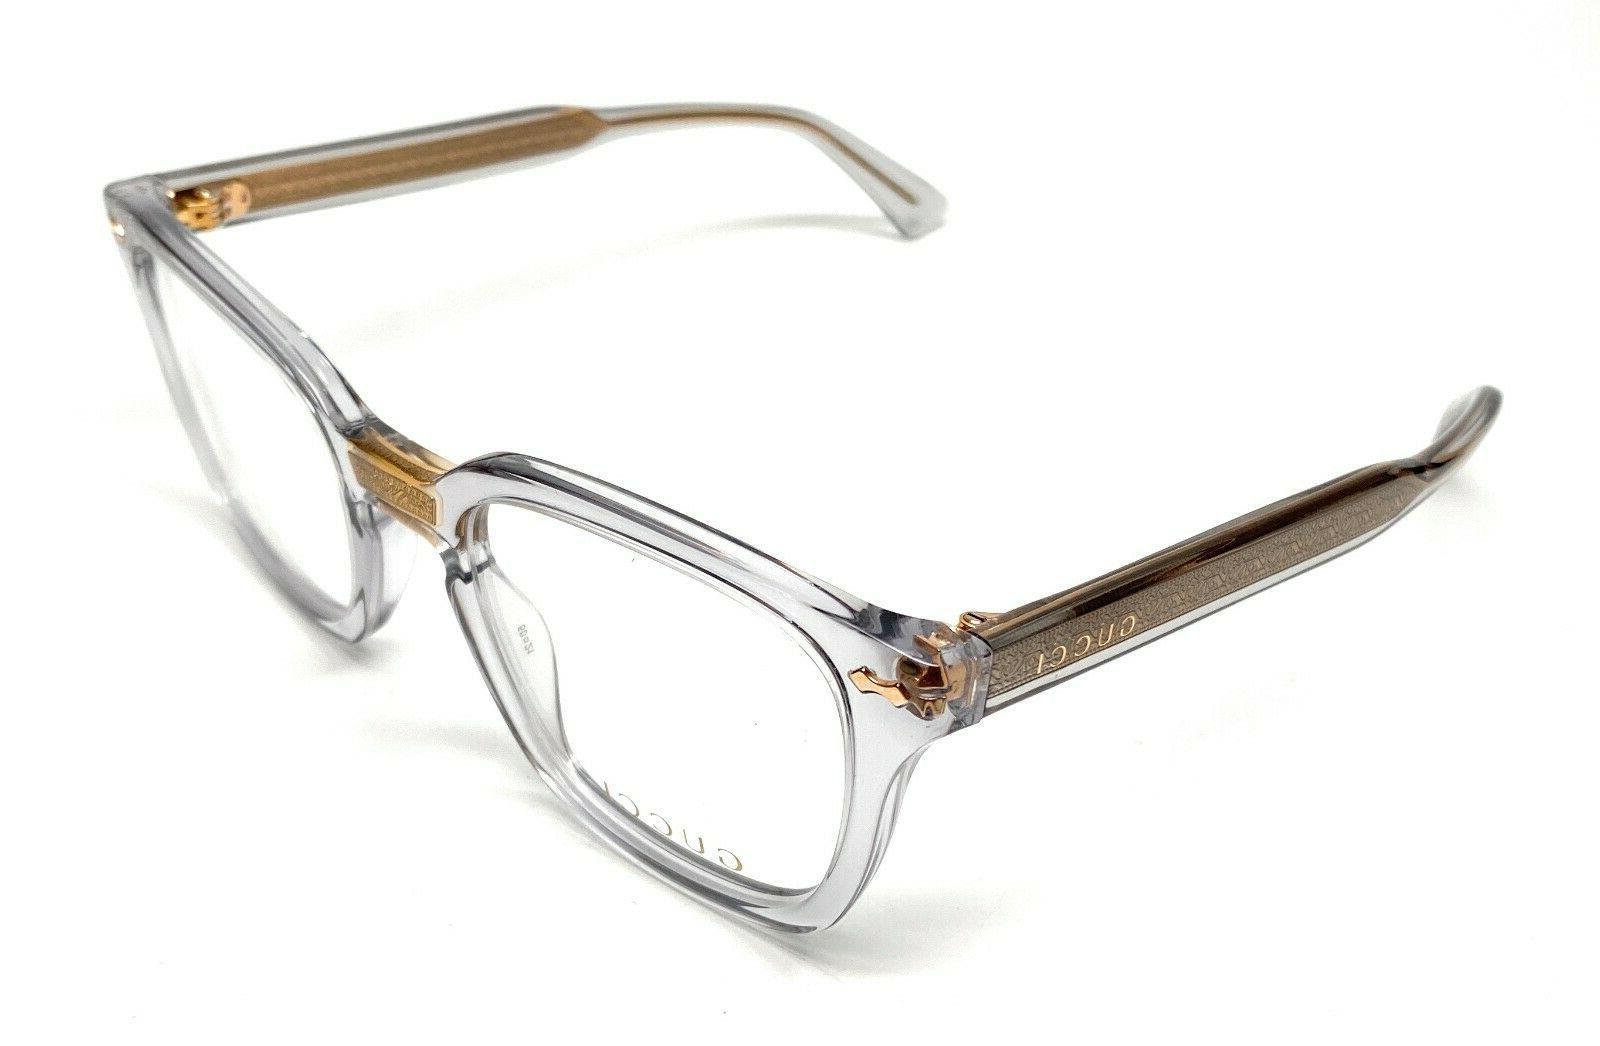 Unisex Authentic Eyeglasses Frame 50-21 A10